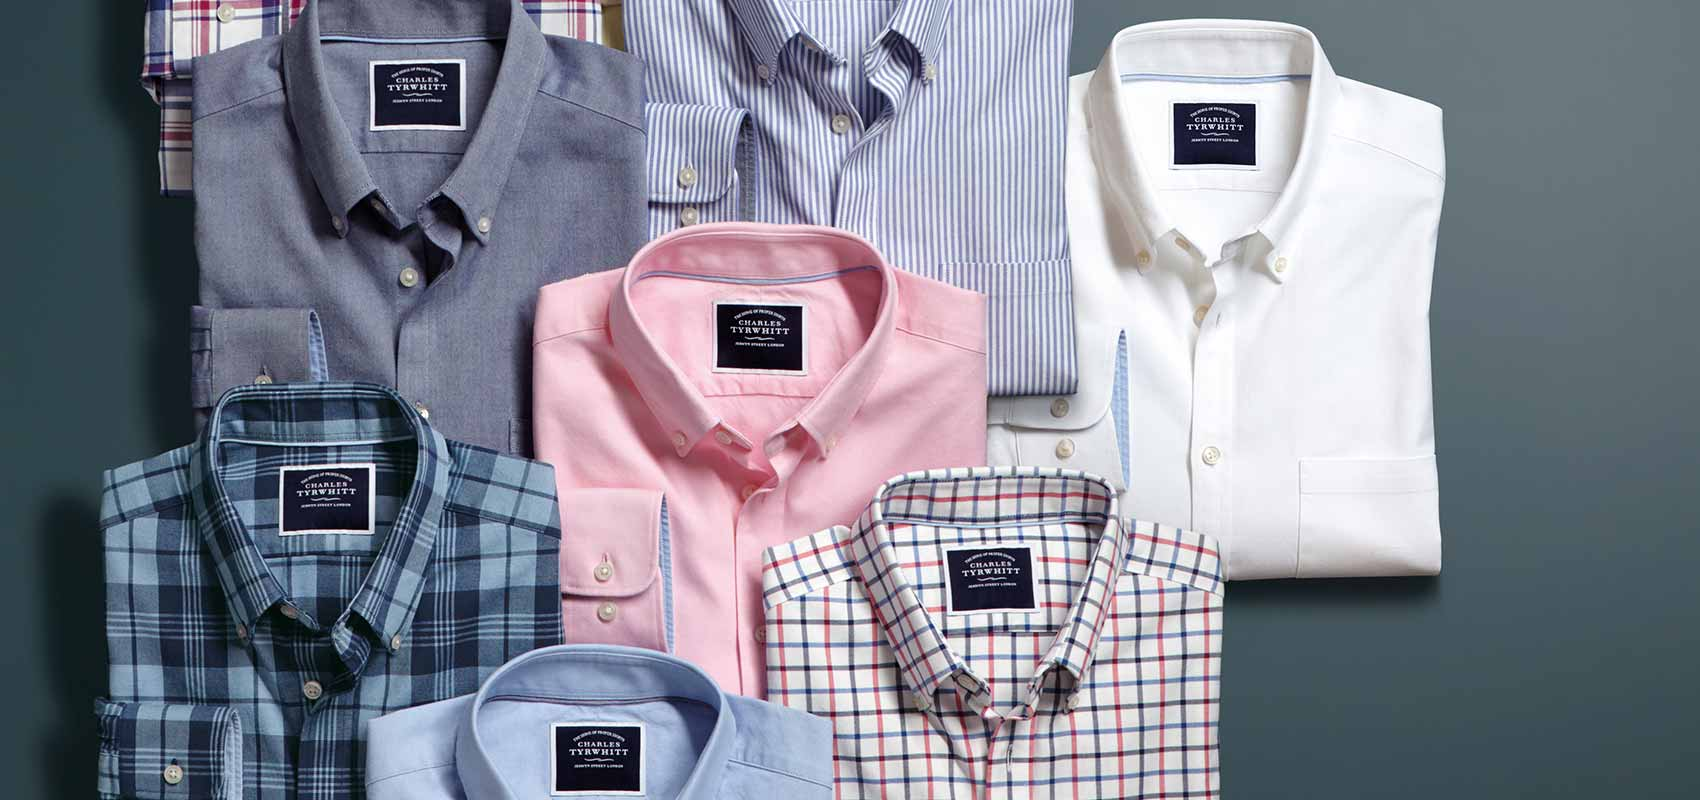 Charles Tyrwhitt  Oxford shirts